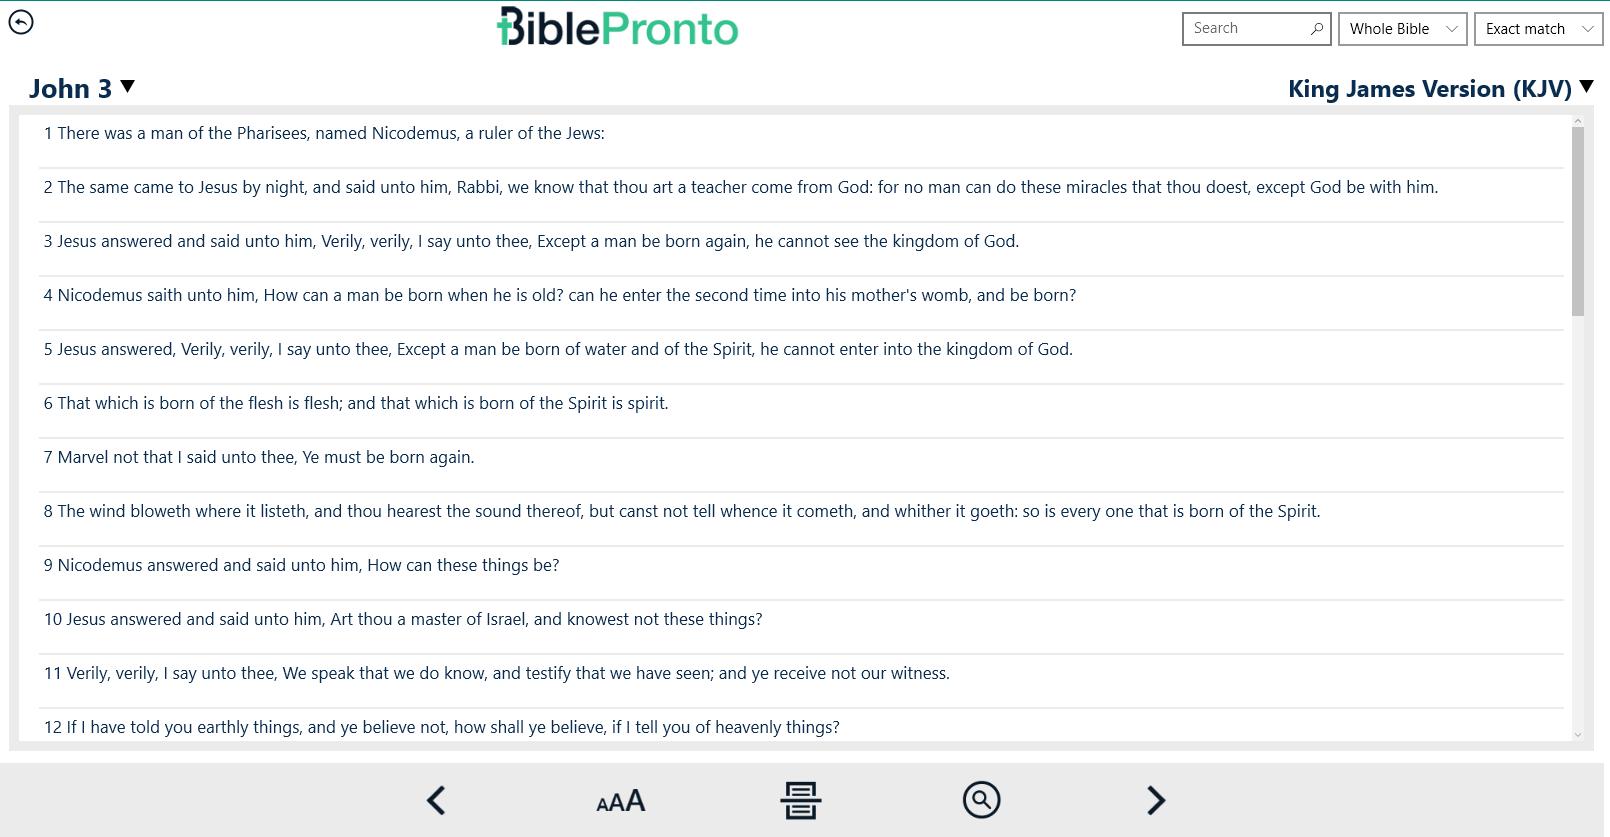 Bible Pronto for Windows 10